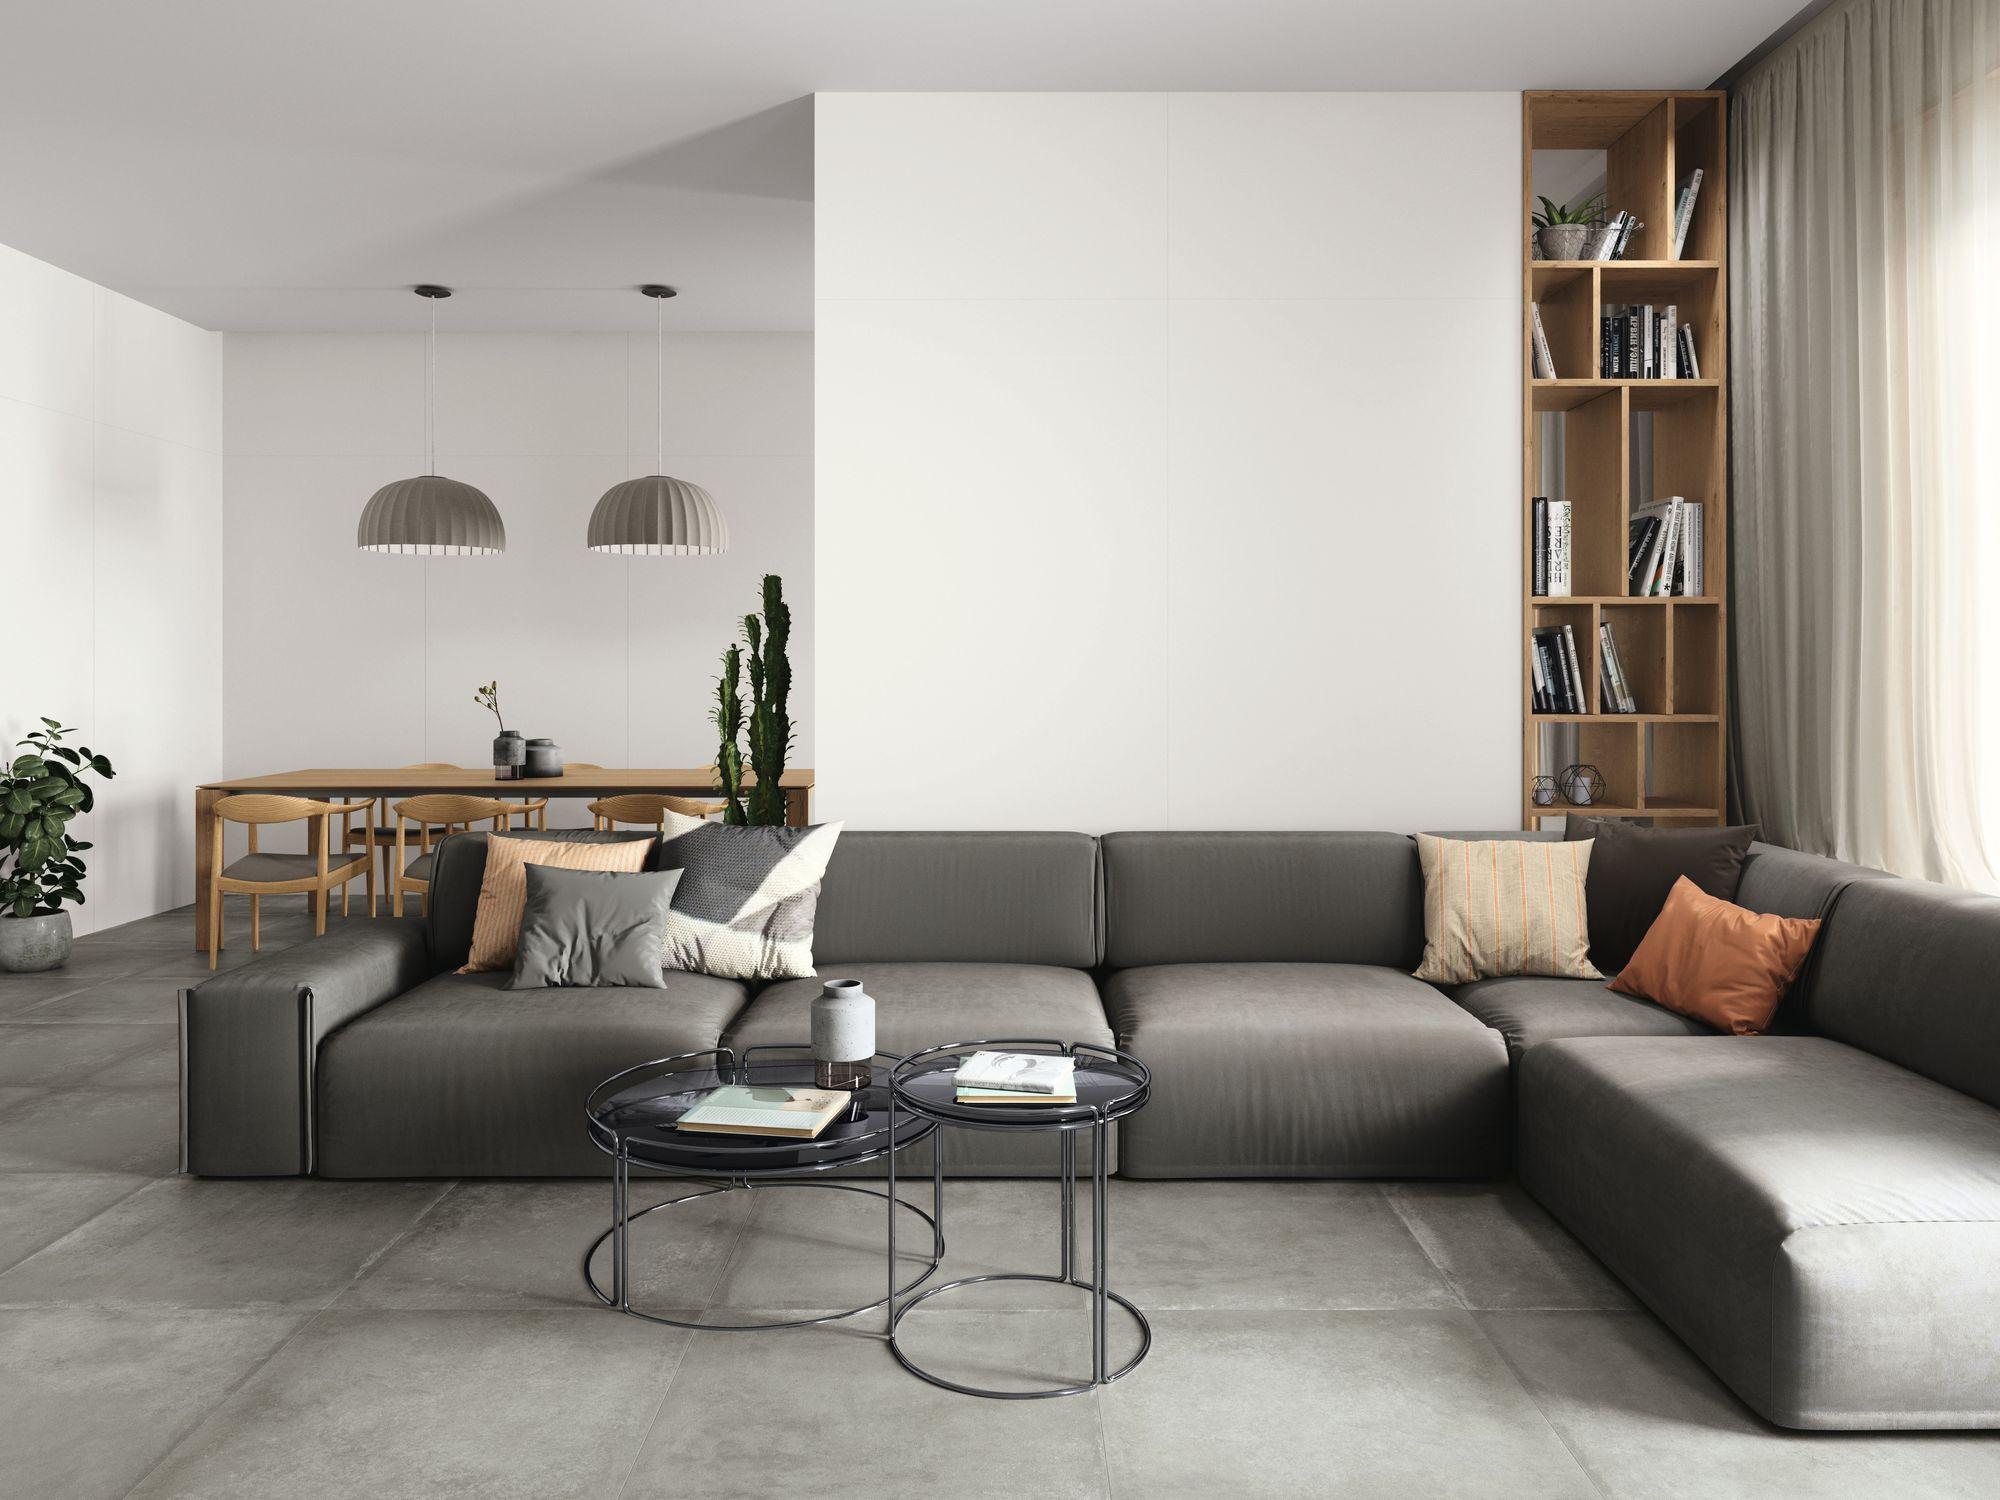 Monocolor Blanco 260x120 cm. Grafton Grey 80x80 cm.